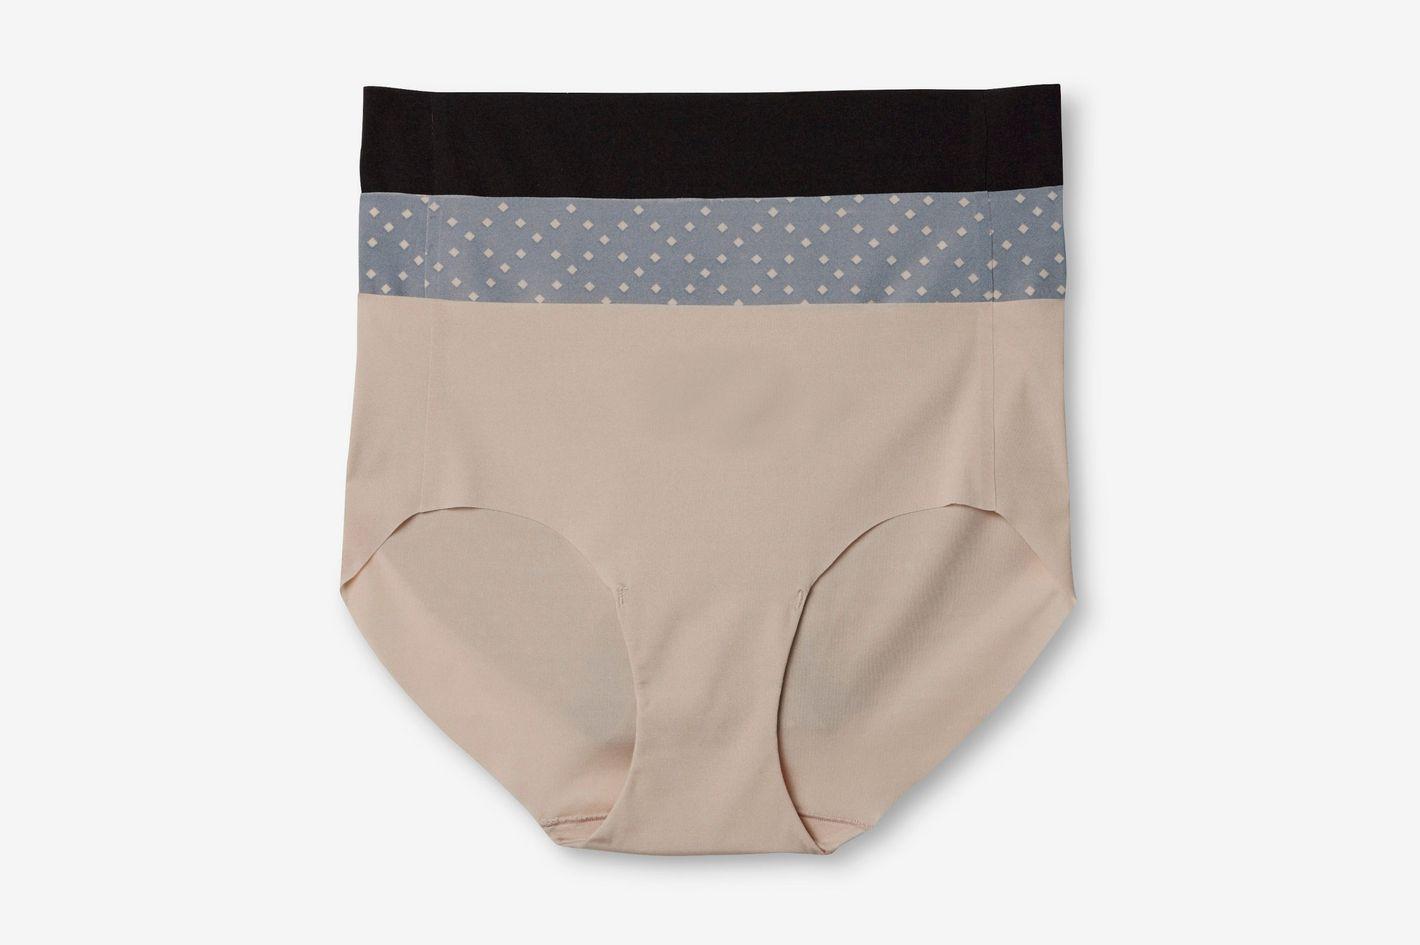 ac0be4d6b Hanes Premium Women s No Lines Microfiber Hipster Underwear 3-Pack